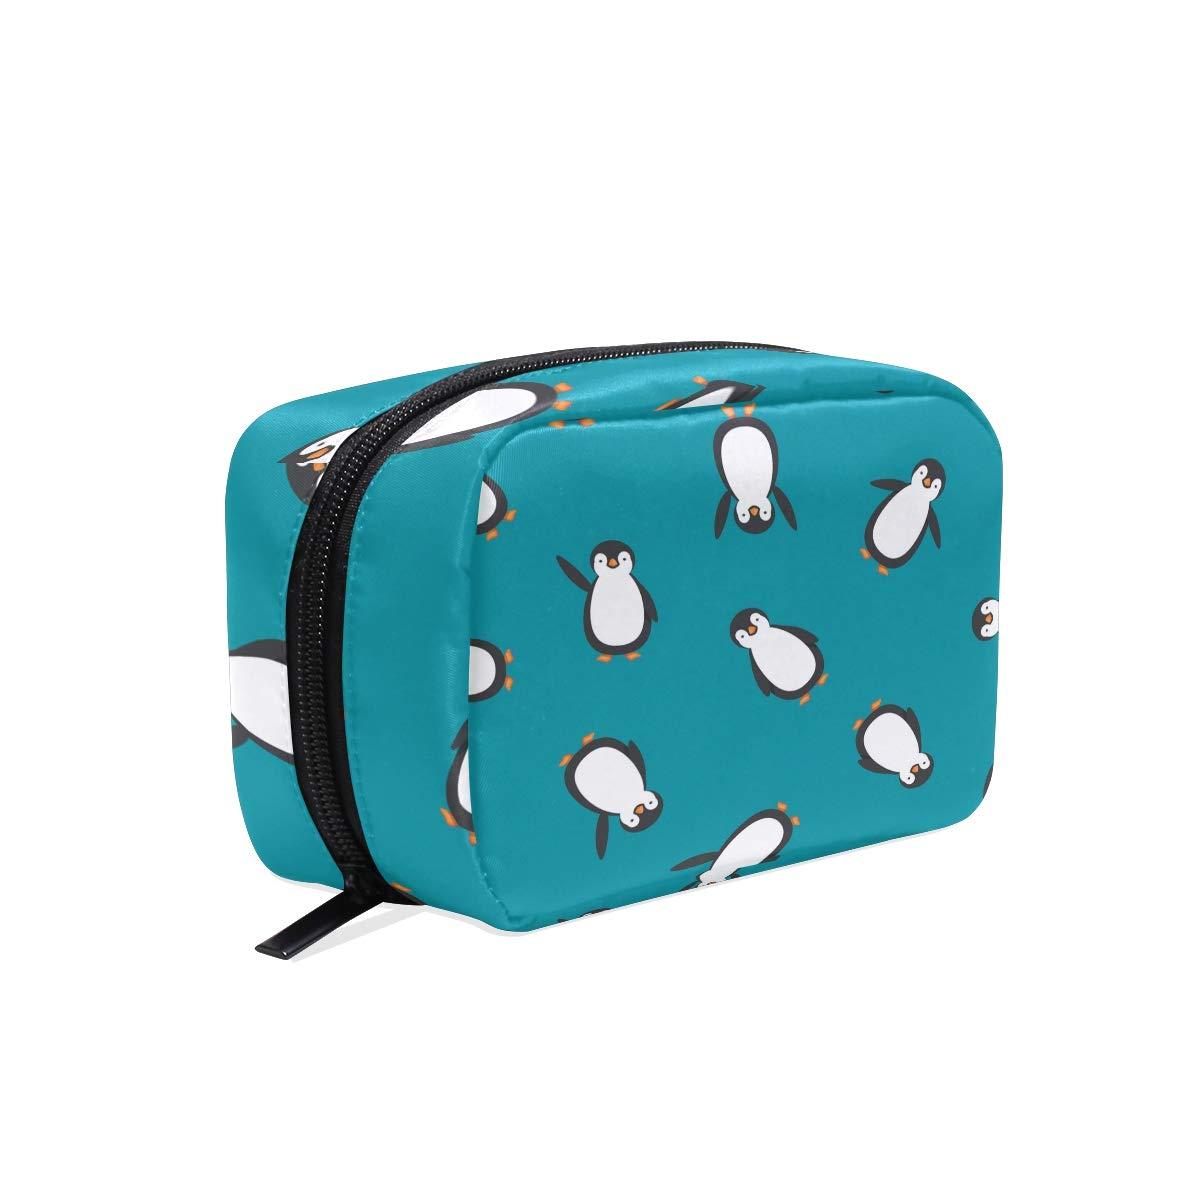 Penguin Hanging Travel Toiletry Bag for Men and Women   Makeup Bag   Cosmetic Bag   Bathroom and Shower Organizer Kit   Leak Proof